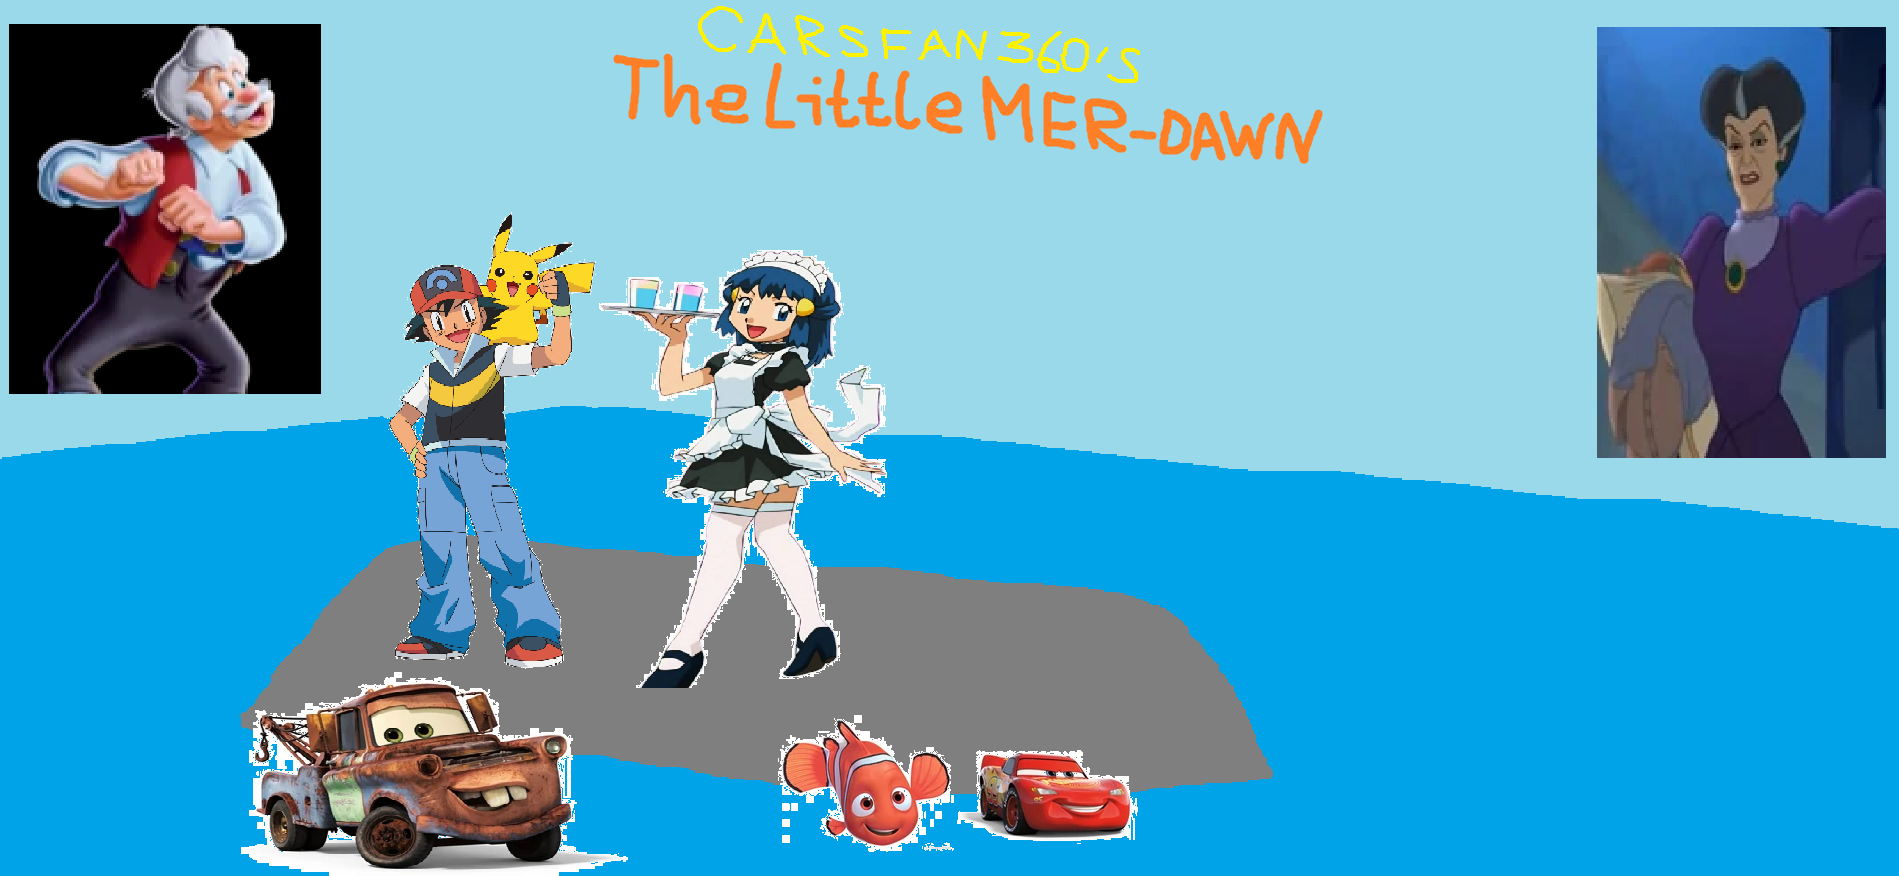 The Little Mer-Dawn (CarsFan360's Style)